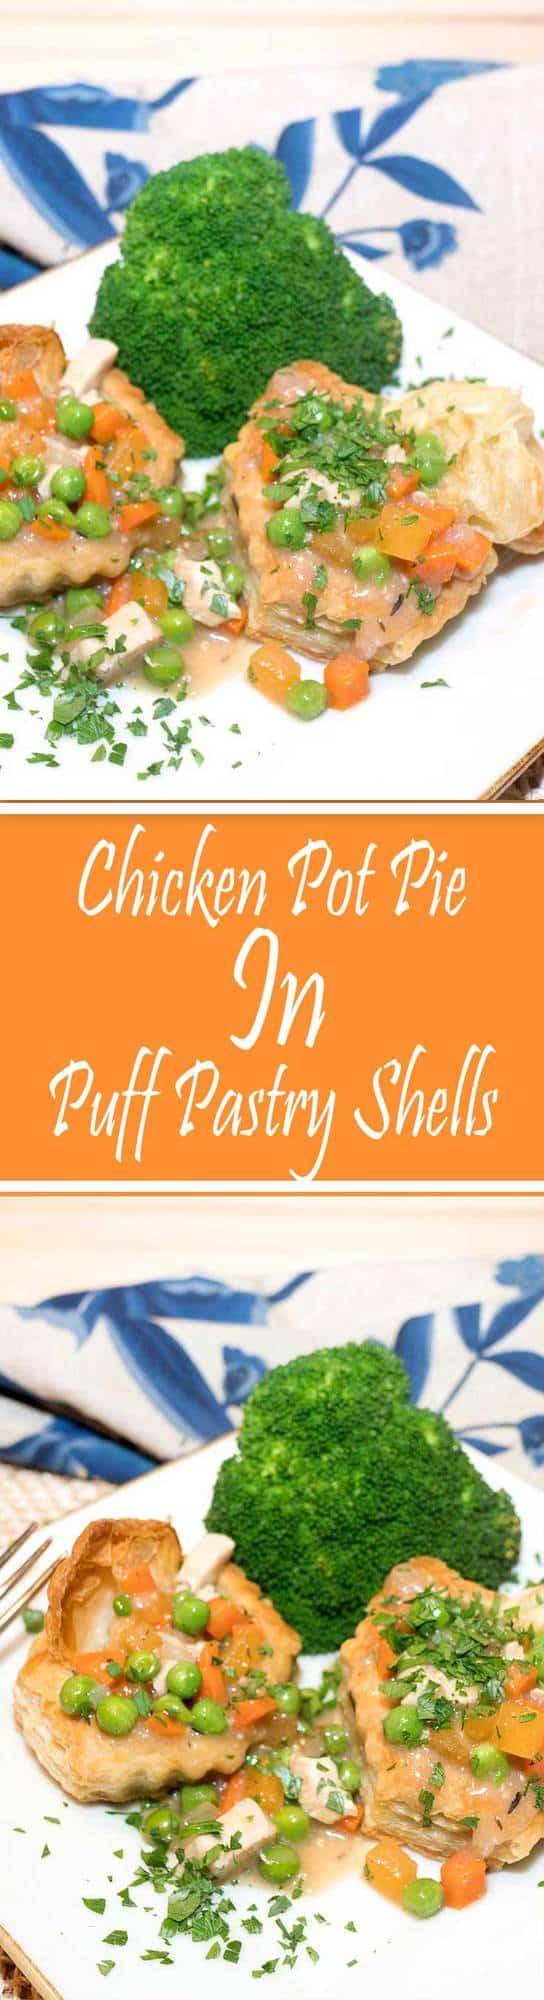 Chicken Pot Pie In Puff Pastry Shells Pudge Factor